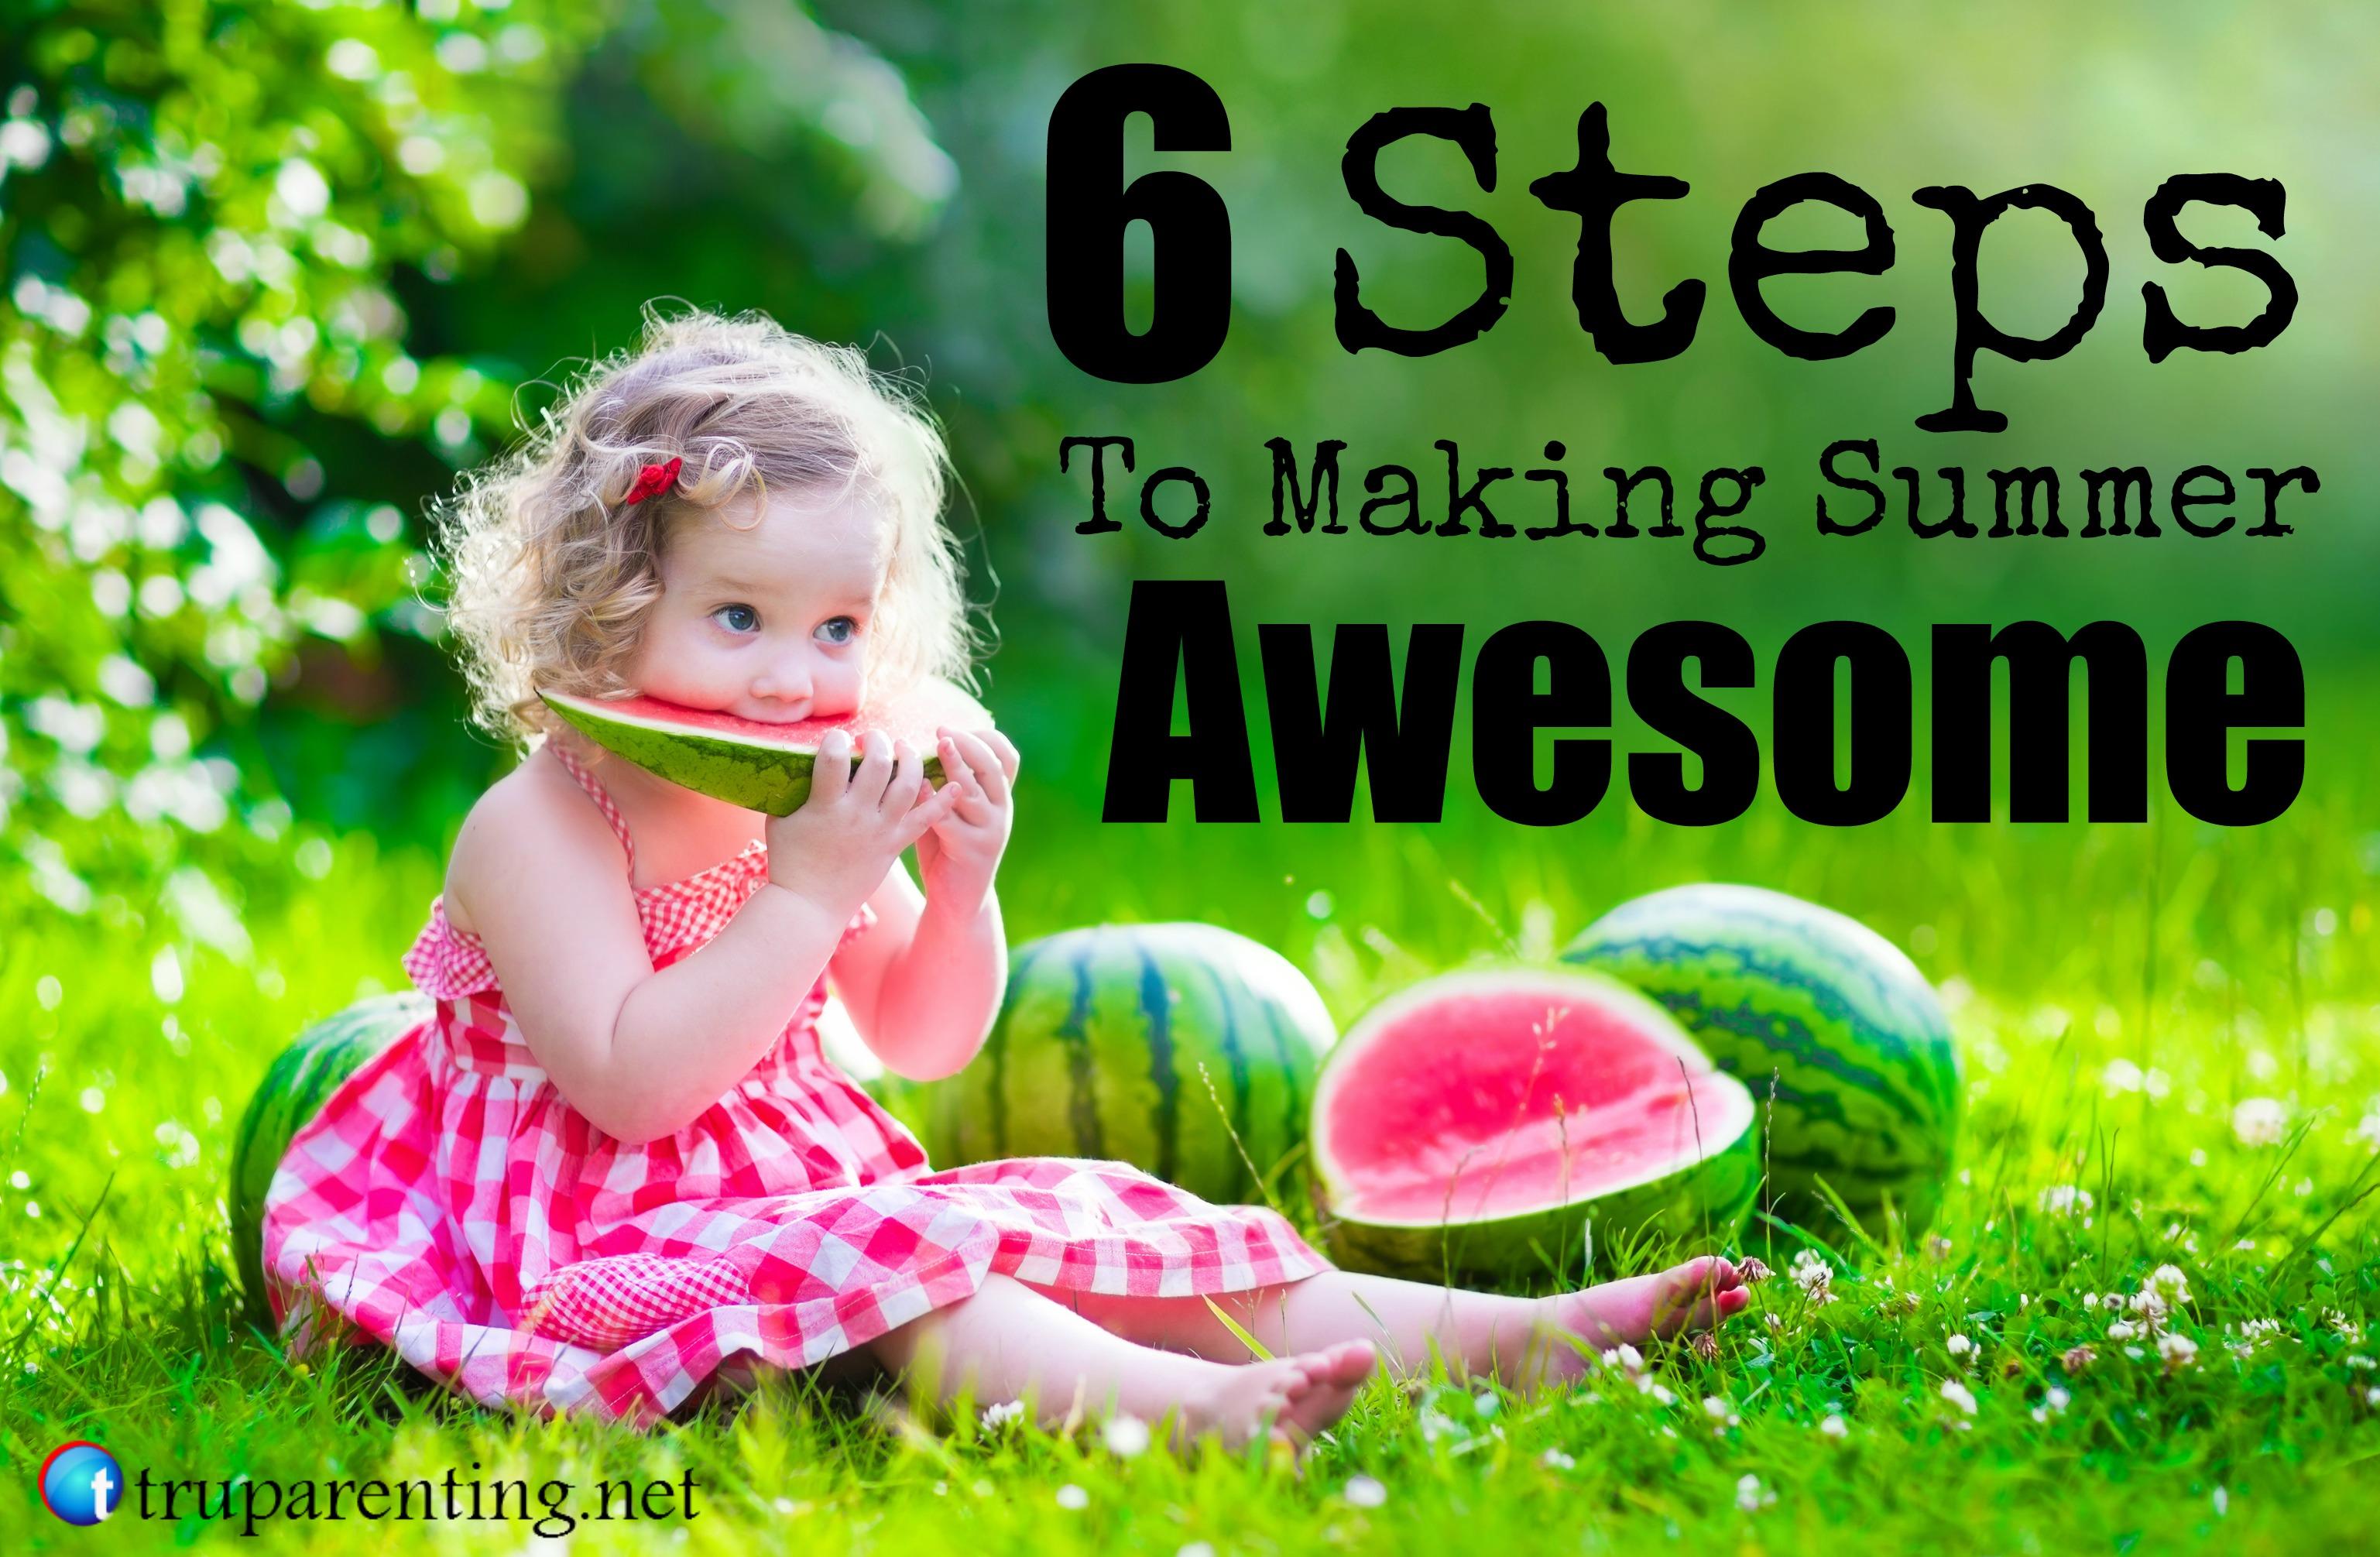 Make summer awesom